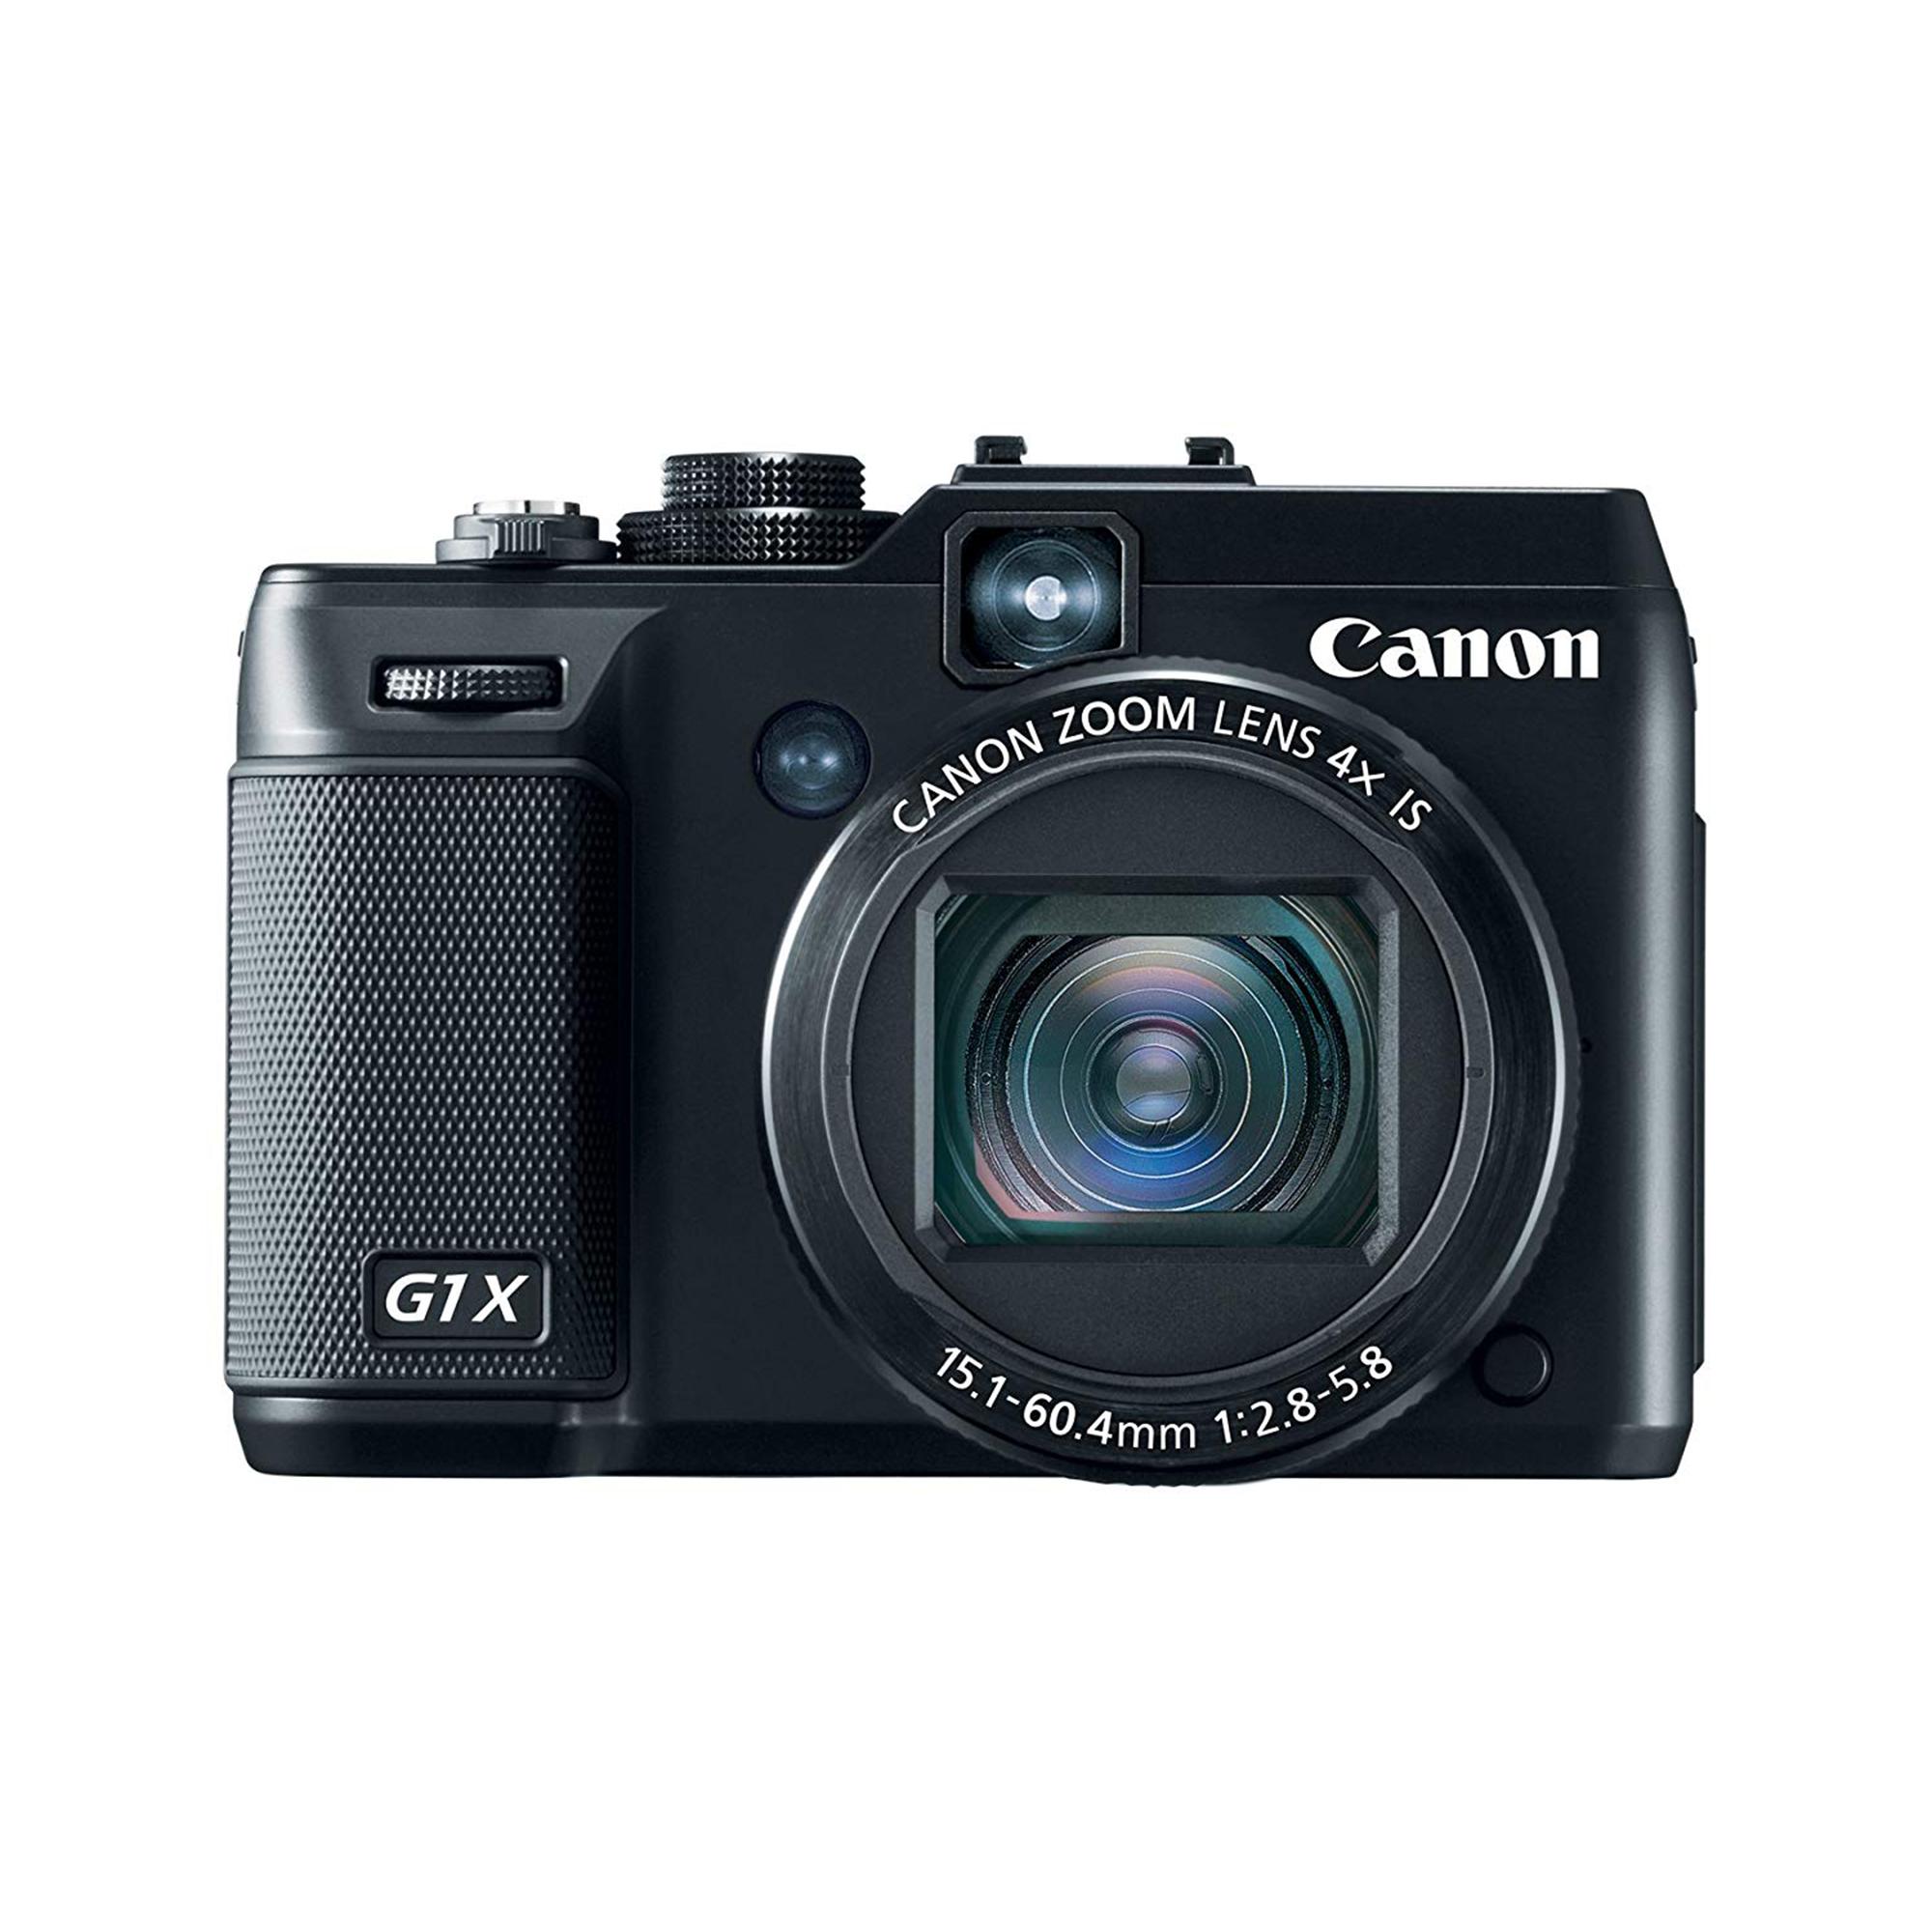 Canon Powershot G1X Digital Camera